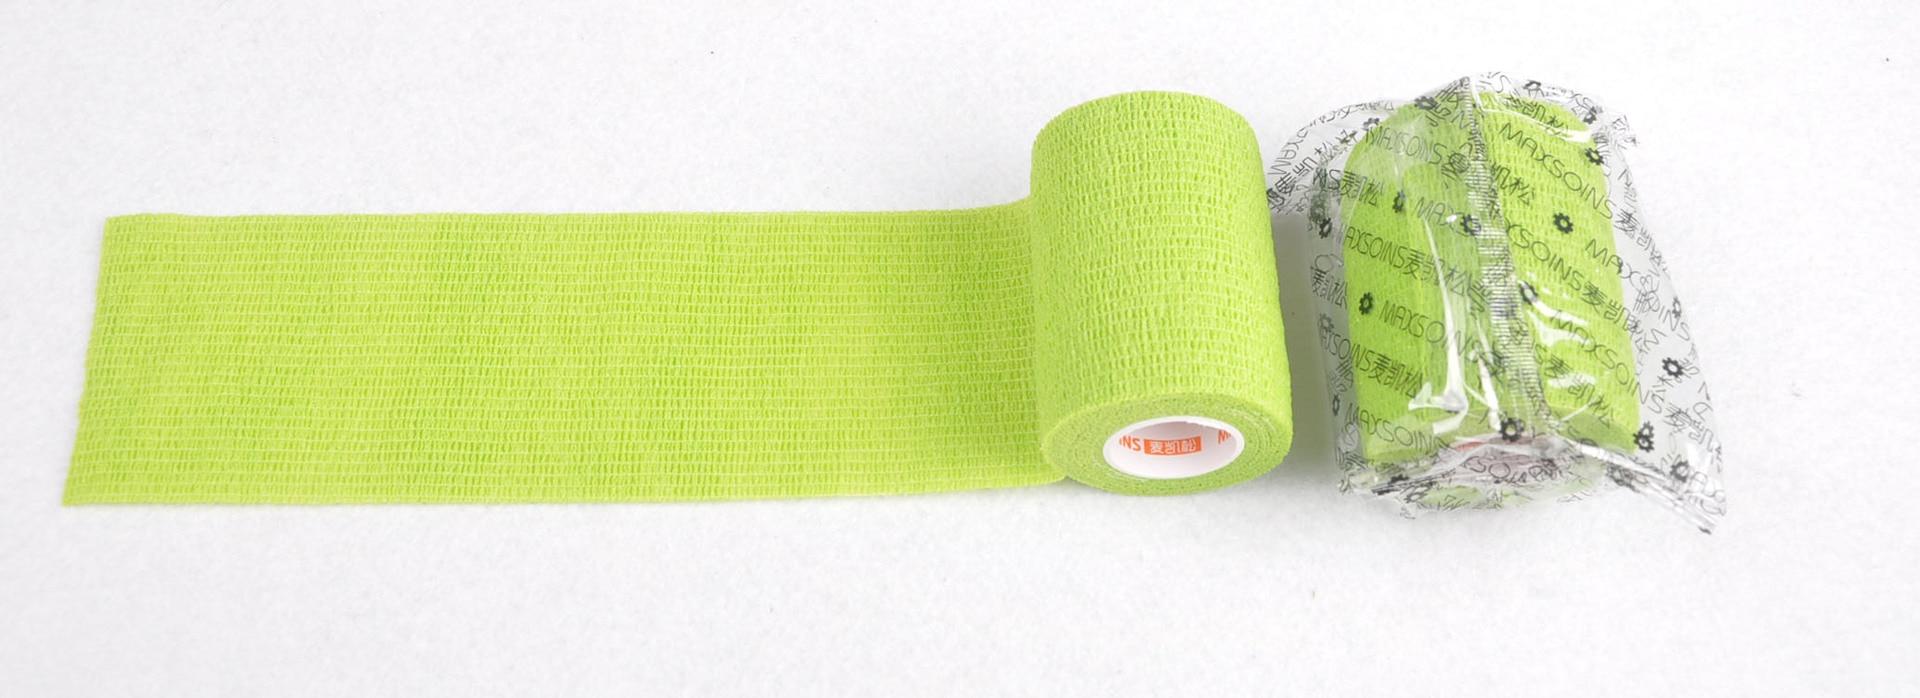 7.5 Cm Grass Green Non-woven Self-adhesive Bandage Sports Bandage Pet Bandage Protective Bandage